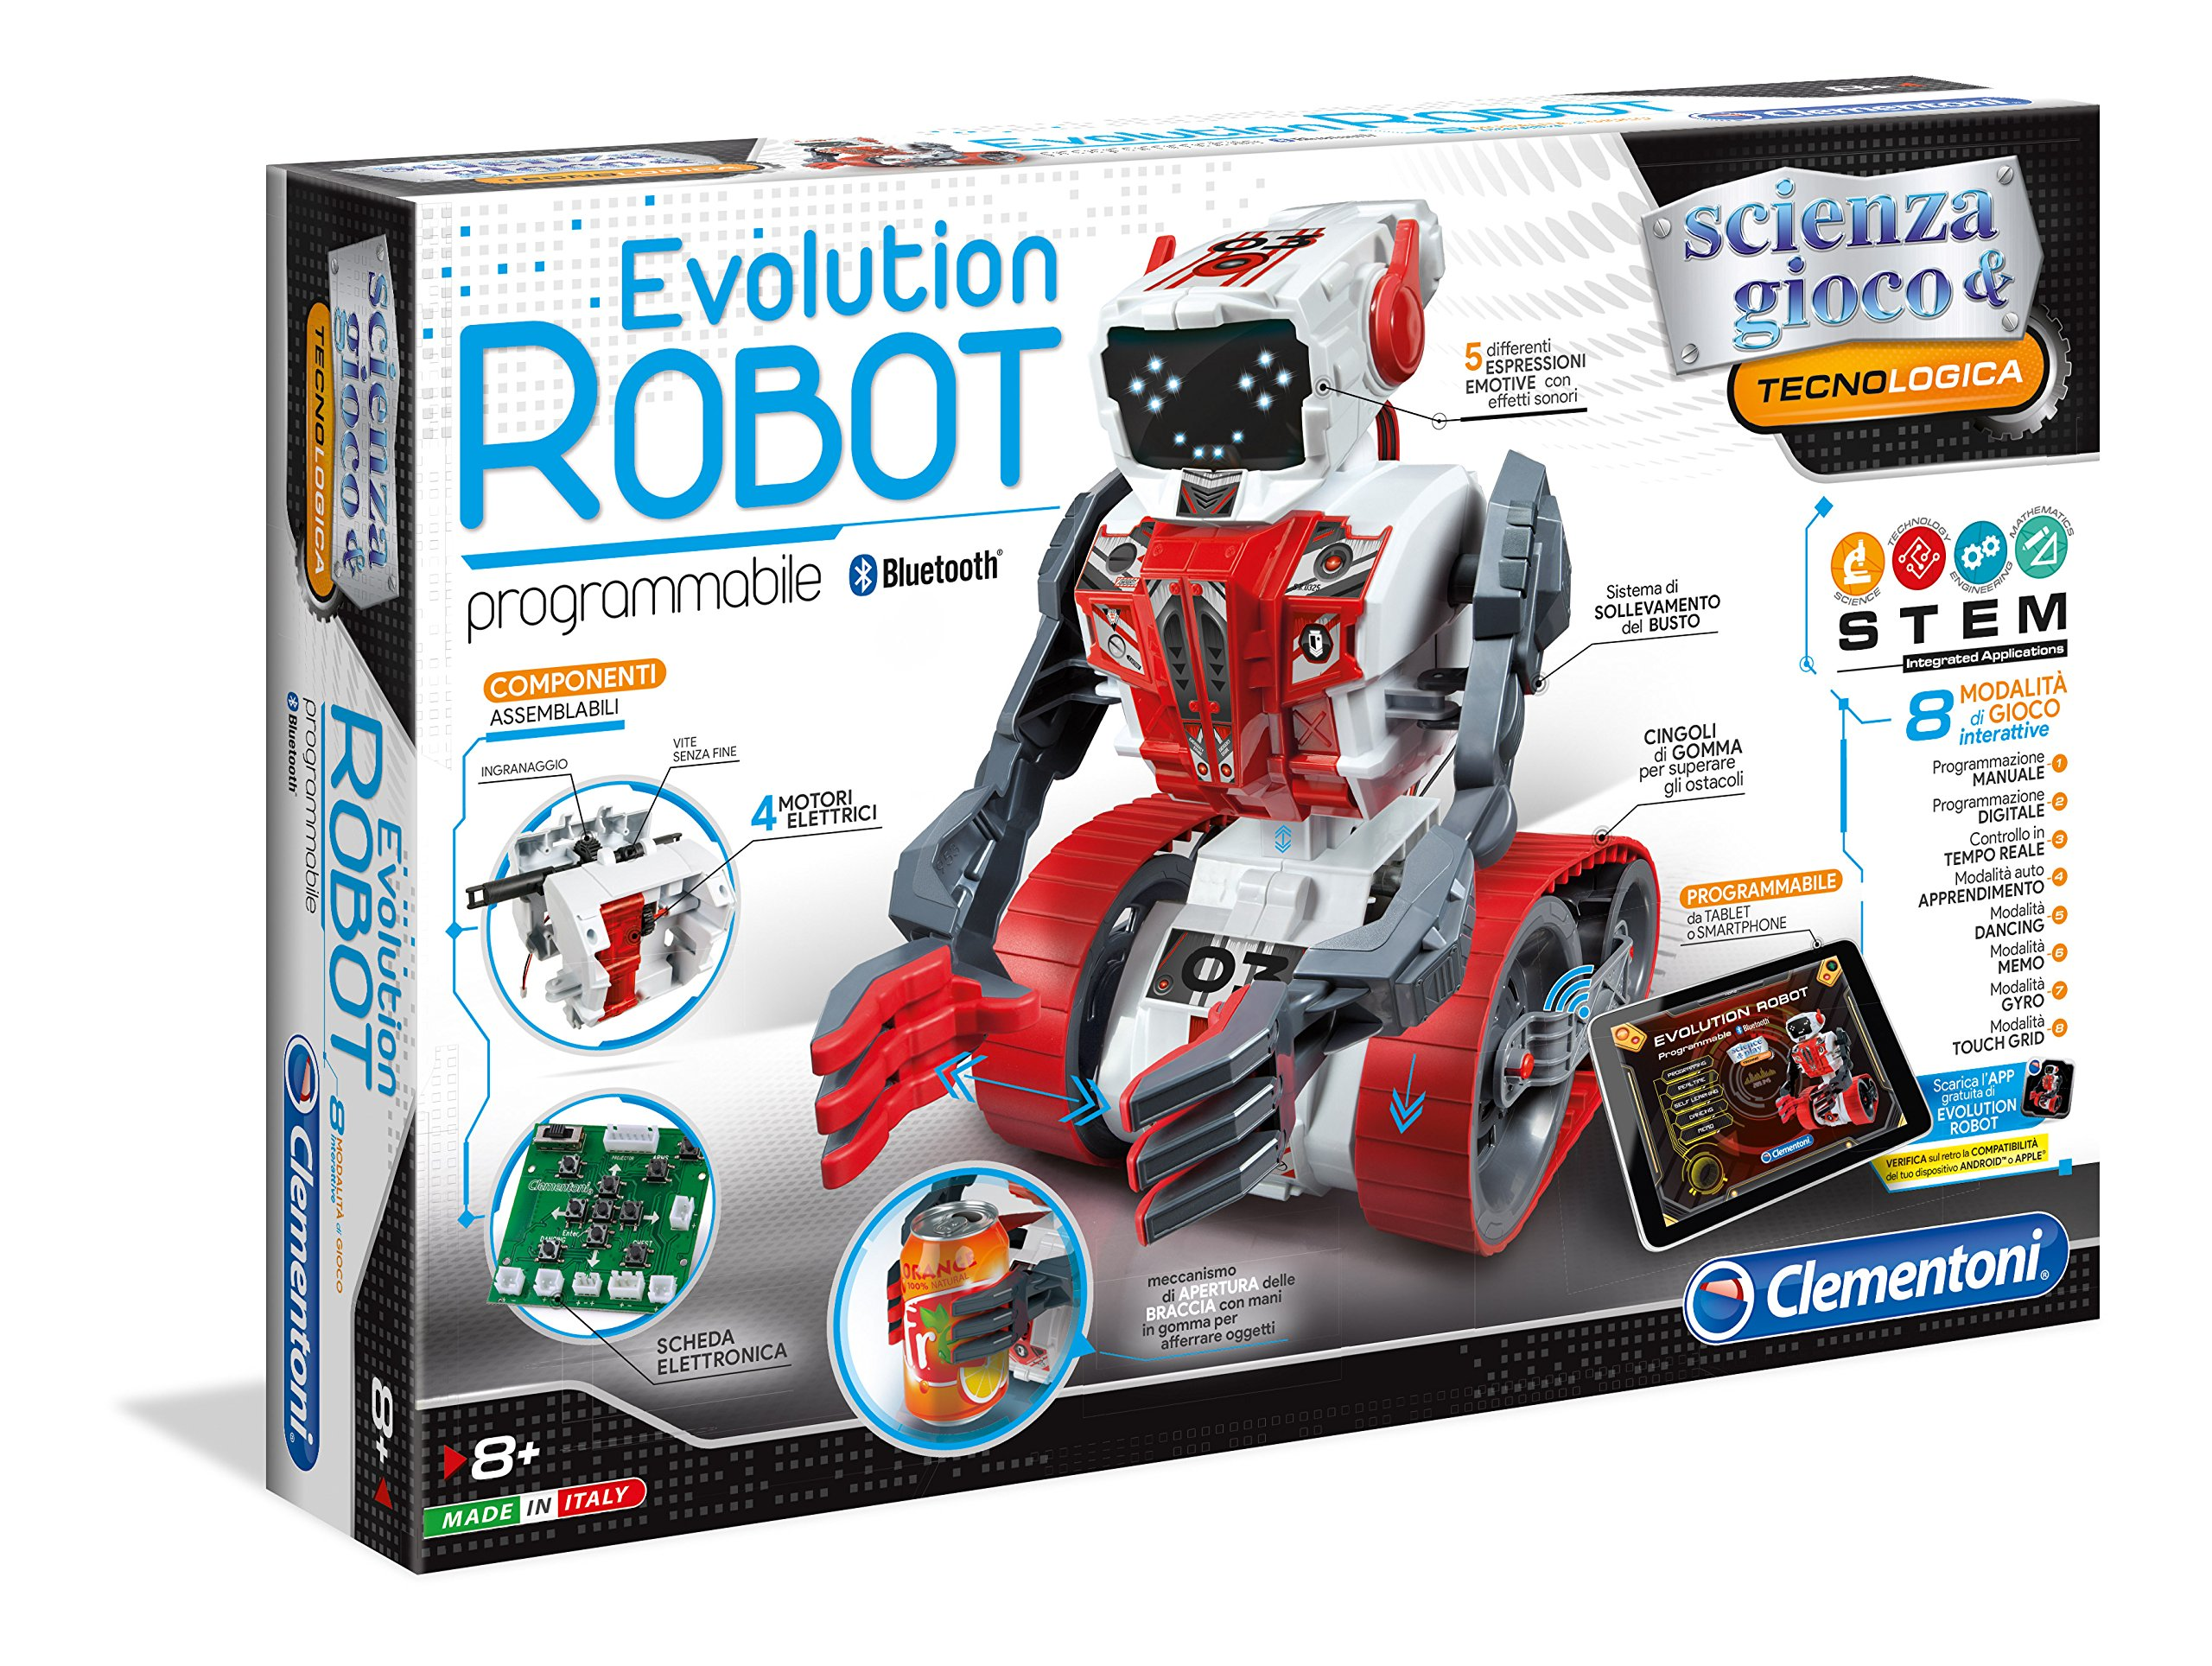 Clementoni Evolution Robot Robot-Remote Control Toys (530mm, 90mm, 360mm, 2.41kg, Box)